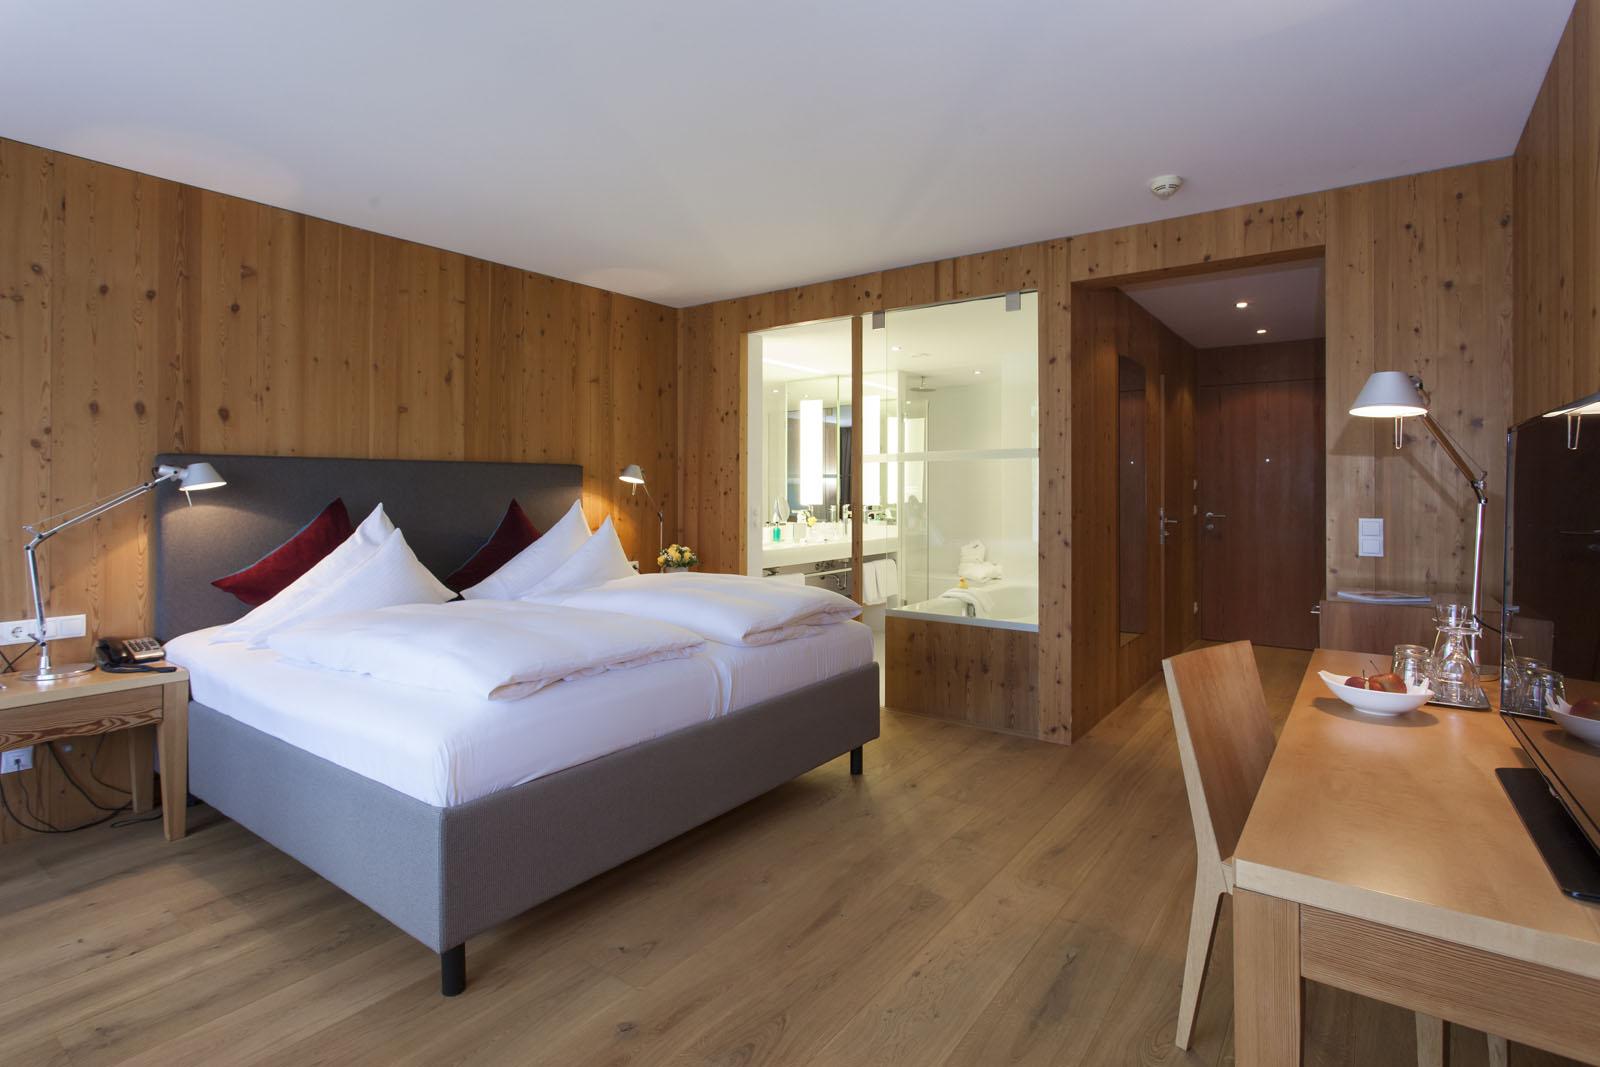 Hotel kranzbach erholung wellness deutschland 33 for Wellness design hotel deutschland